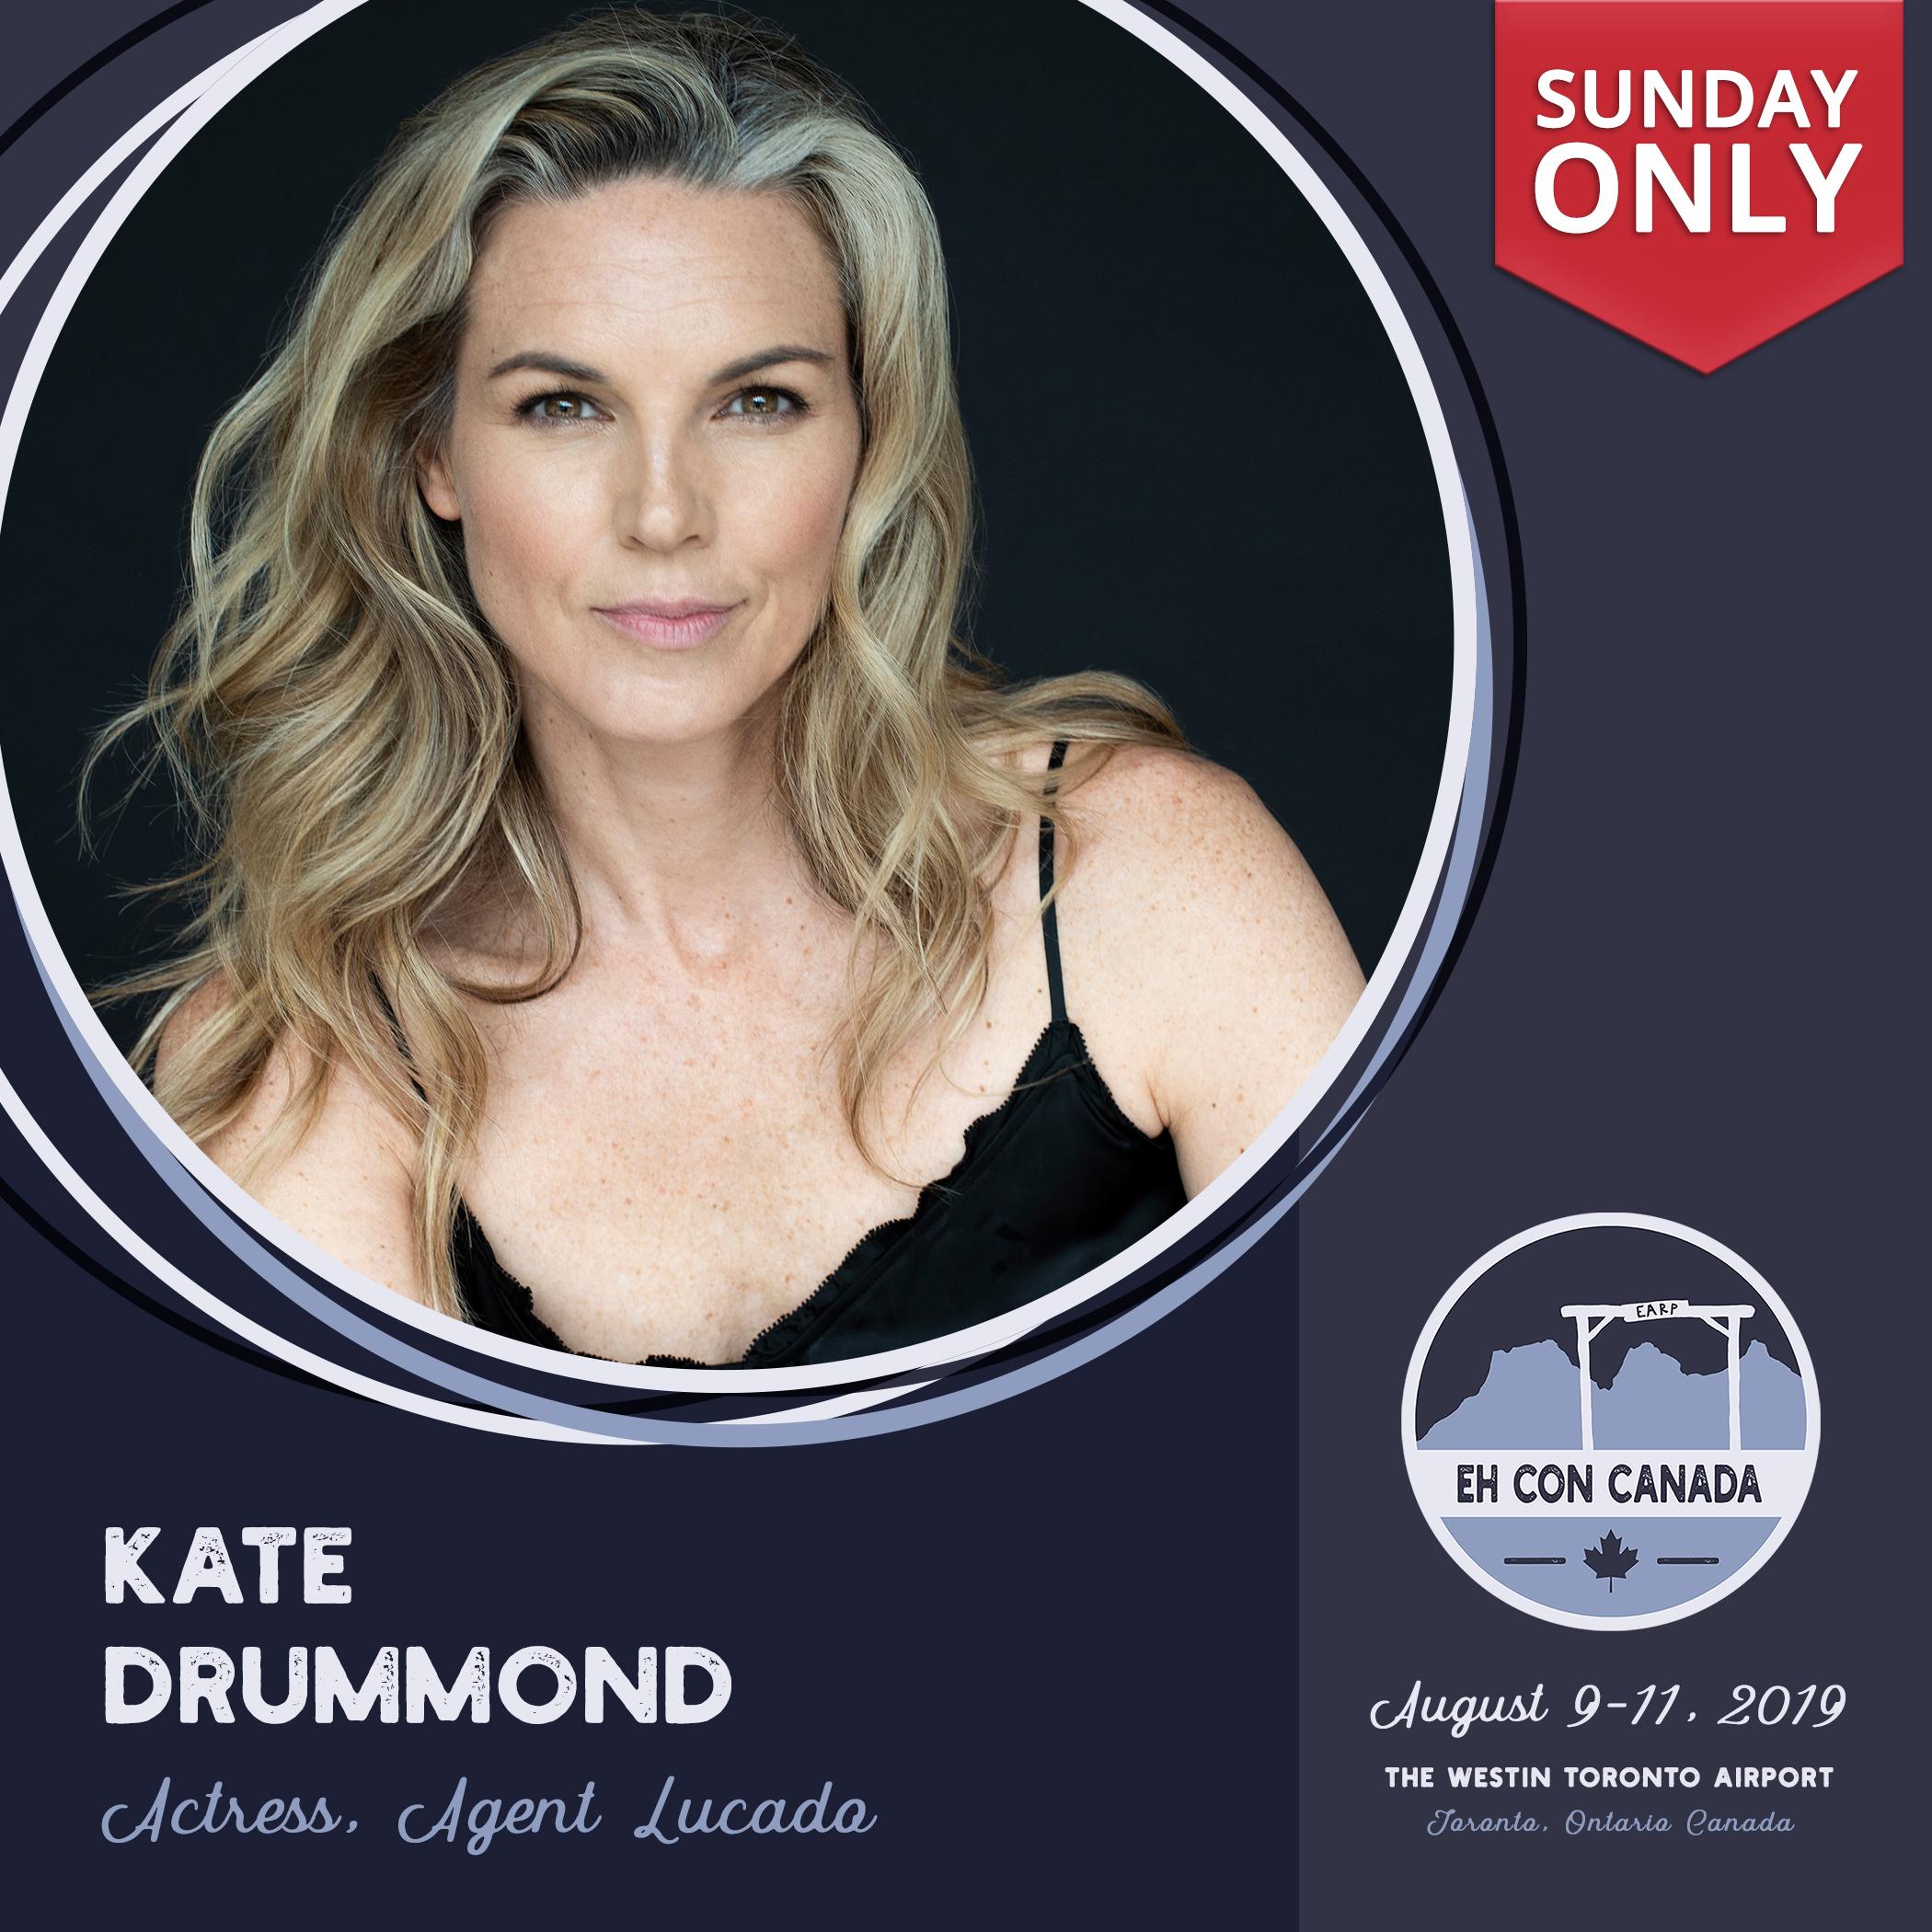 Kate's Bio